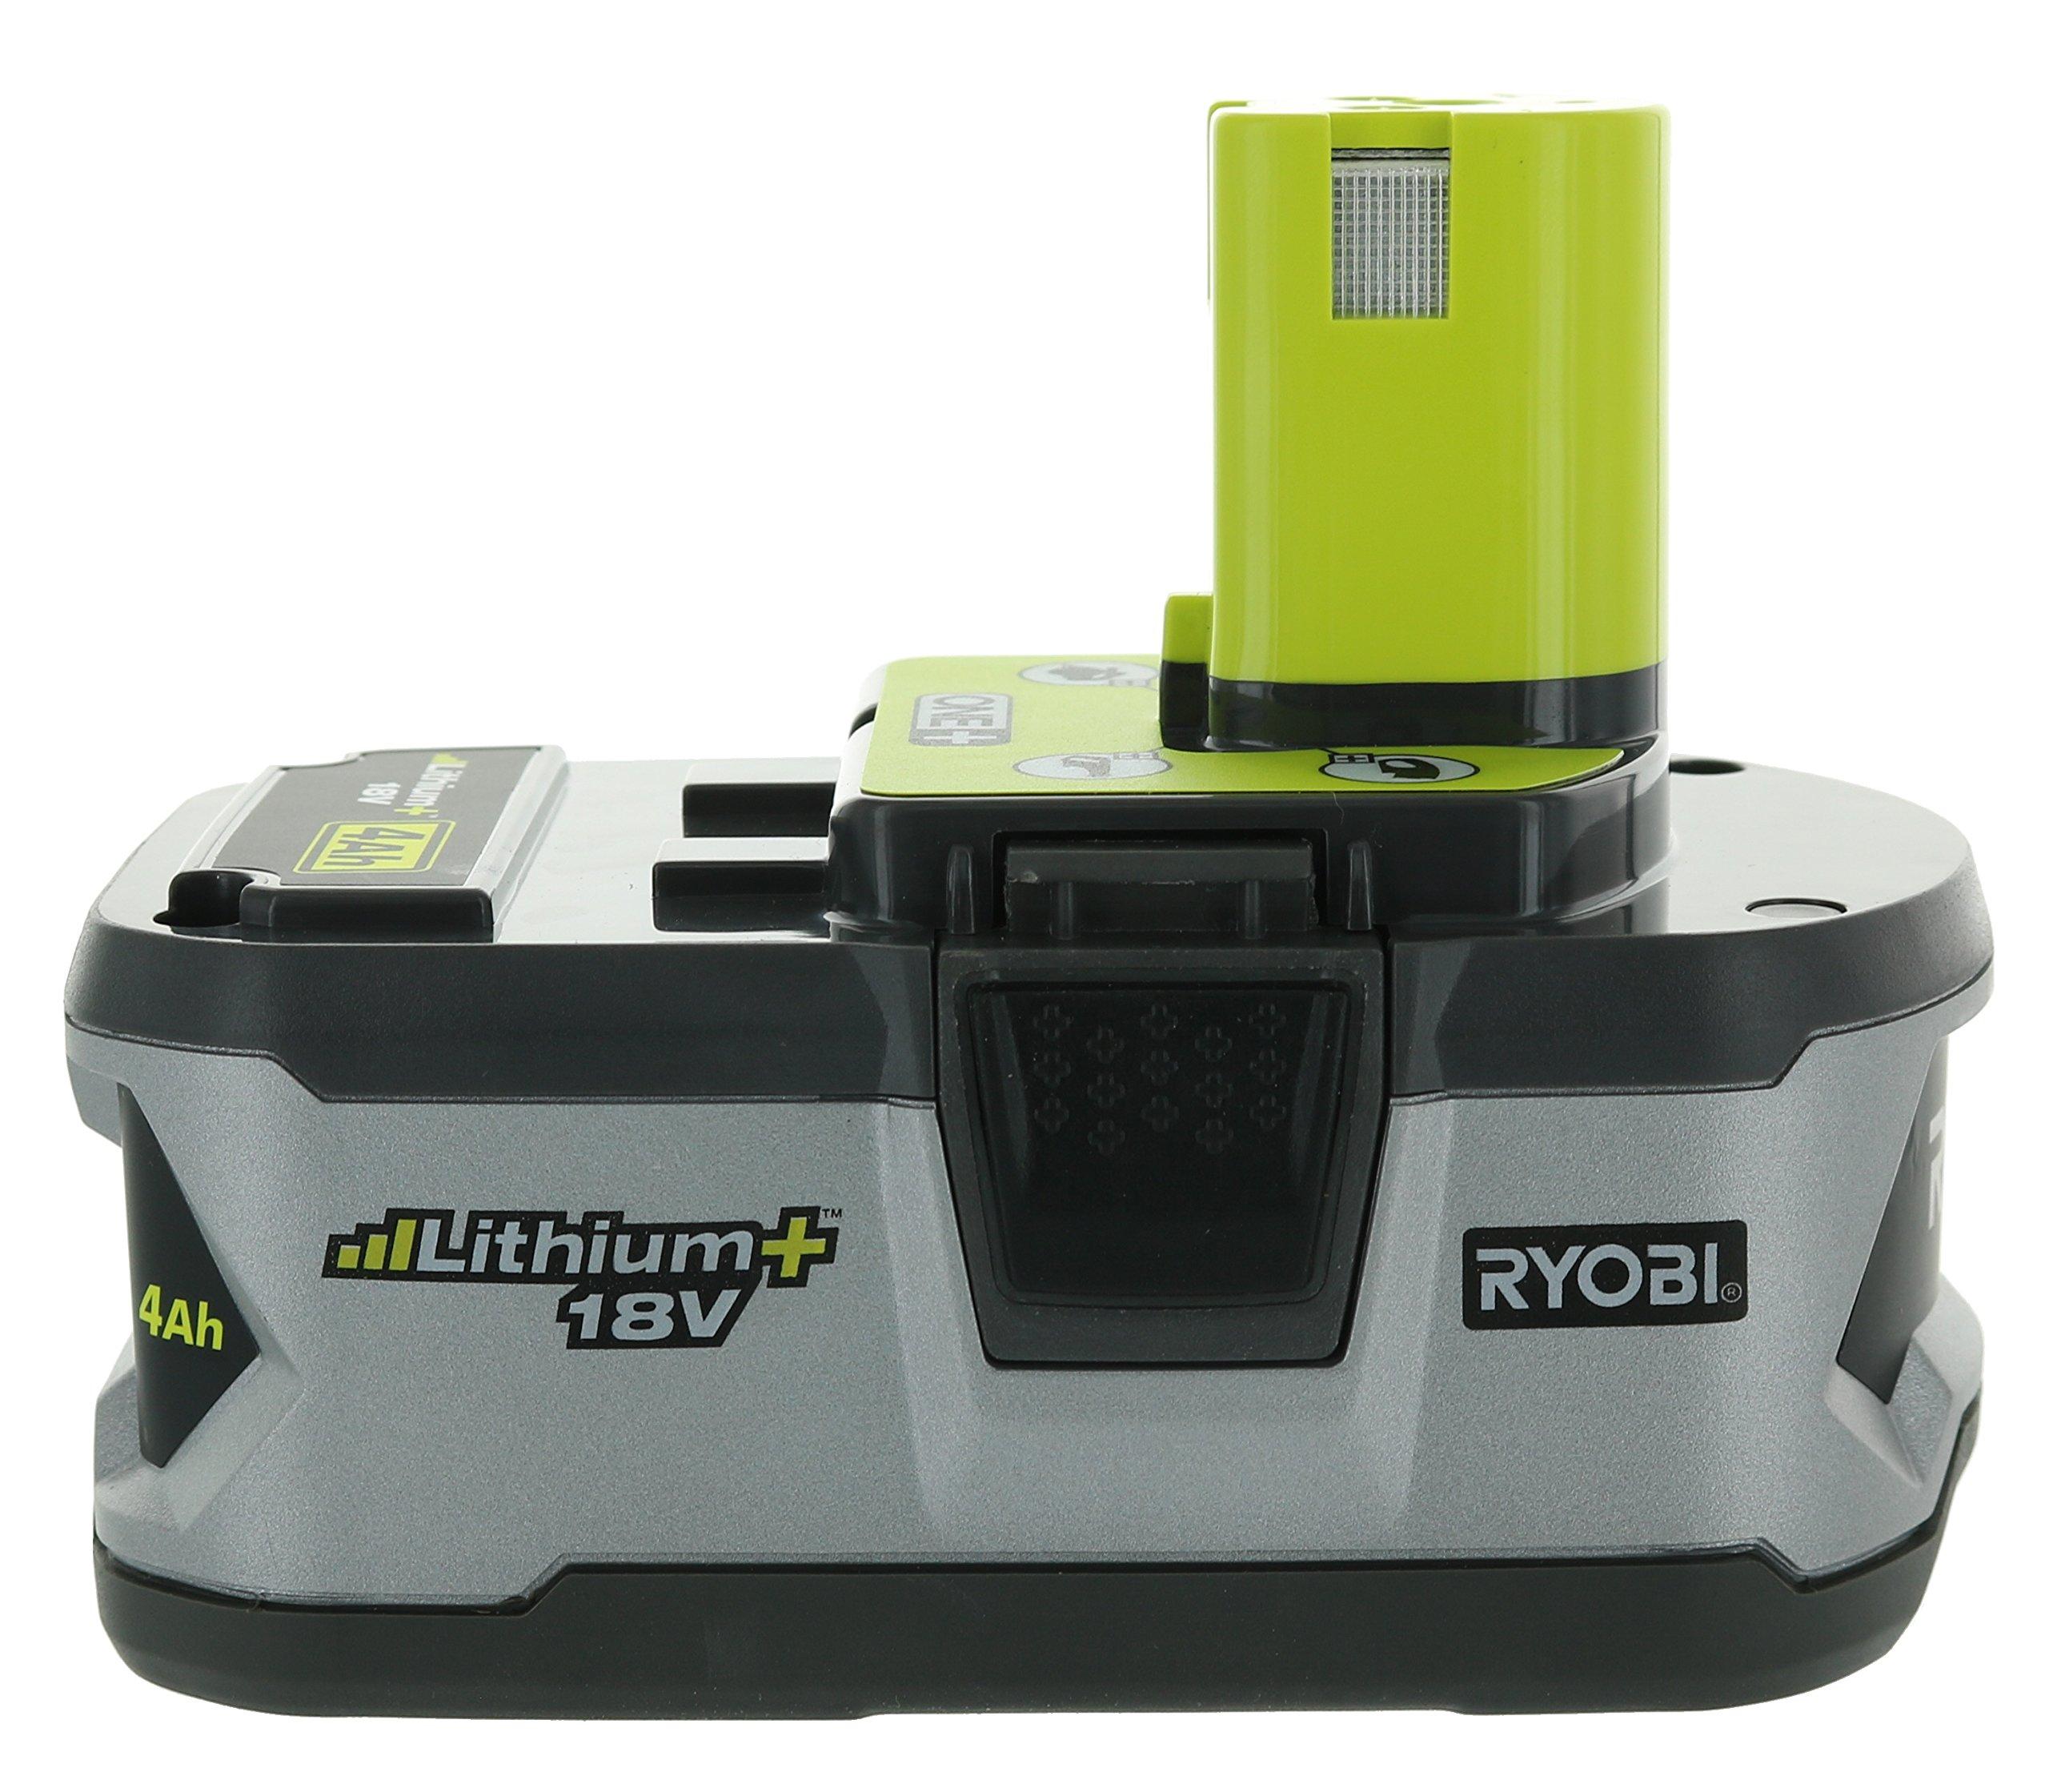 Ryobi P122 4AH One+ High Capacity Lithium Ion Batteries For Ryobi Power Tools (2 Pack of P108 Batteries) by Ryobi (Image #6)